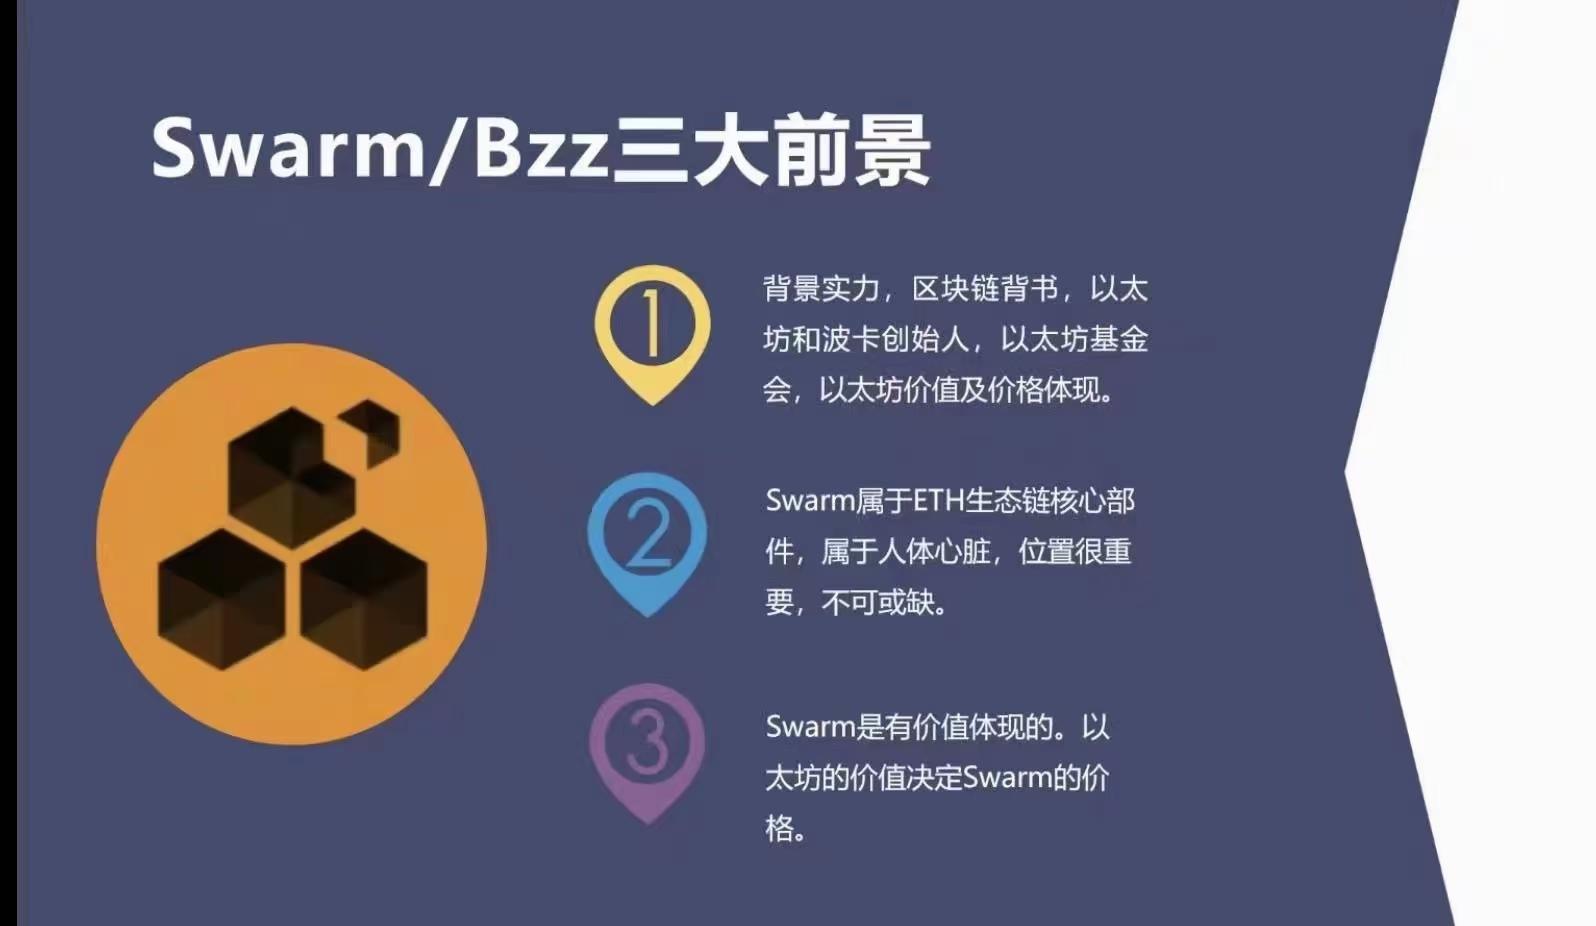 swarm bzz潜力巨大 下半年的挖矿大热门